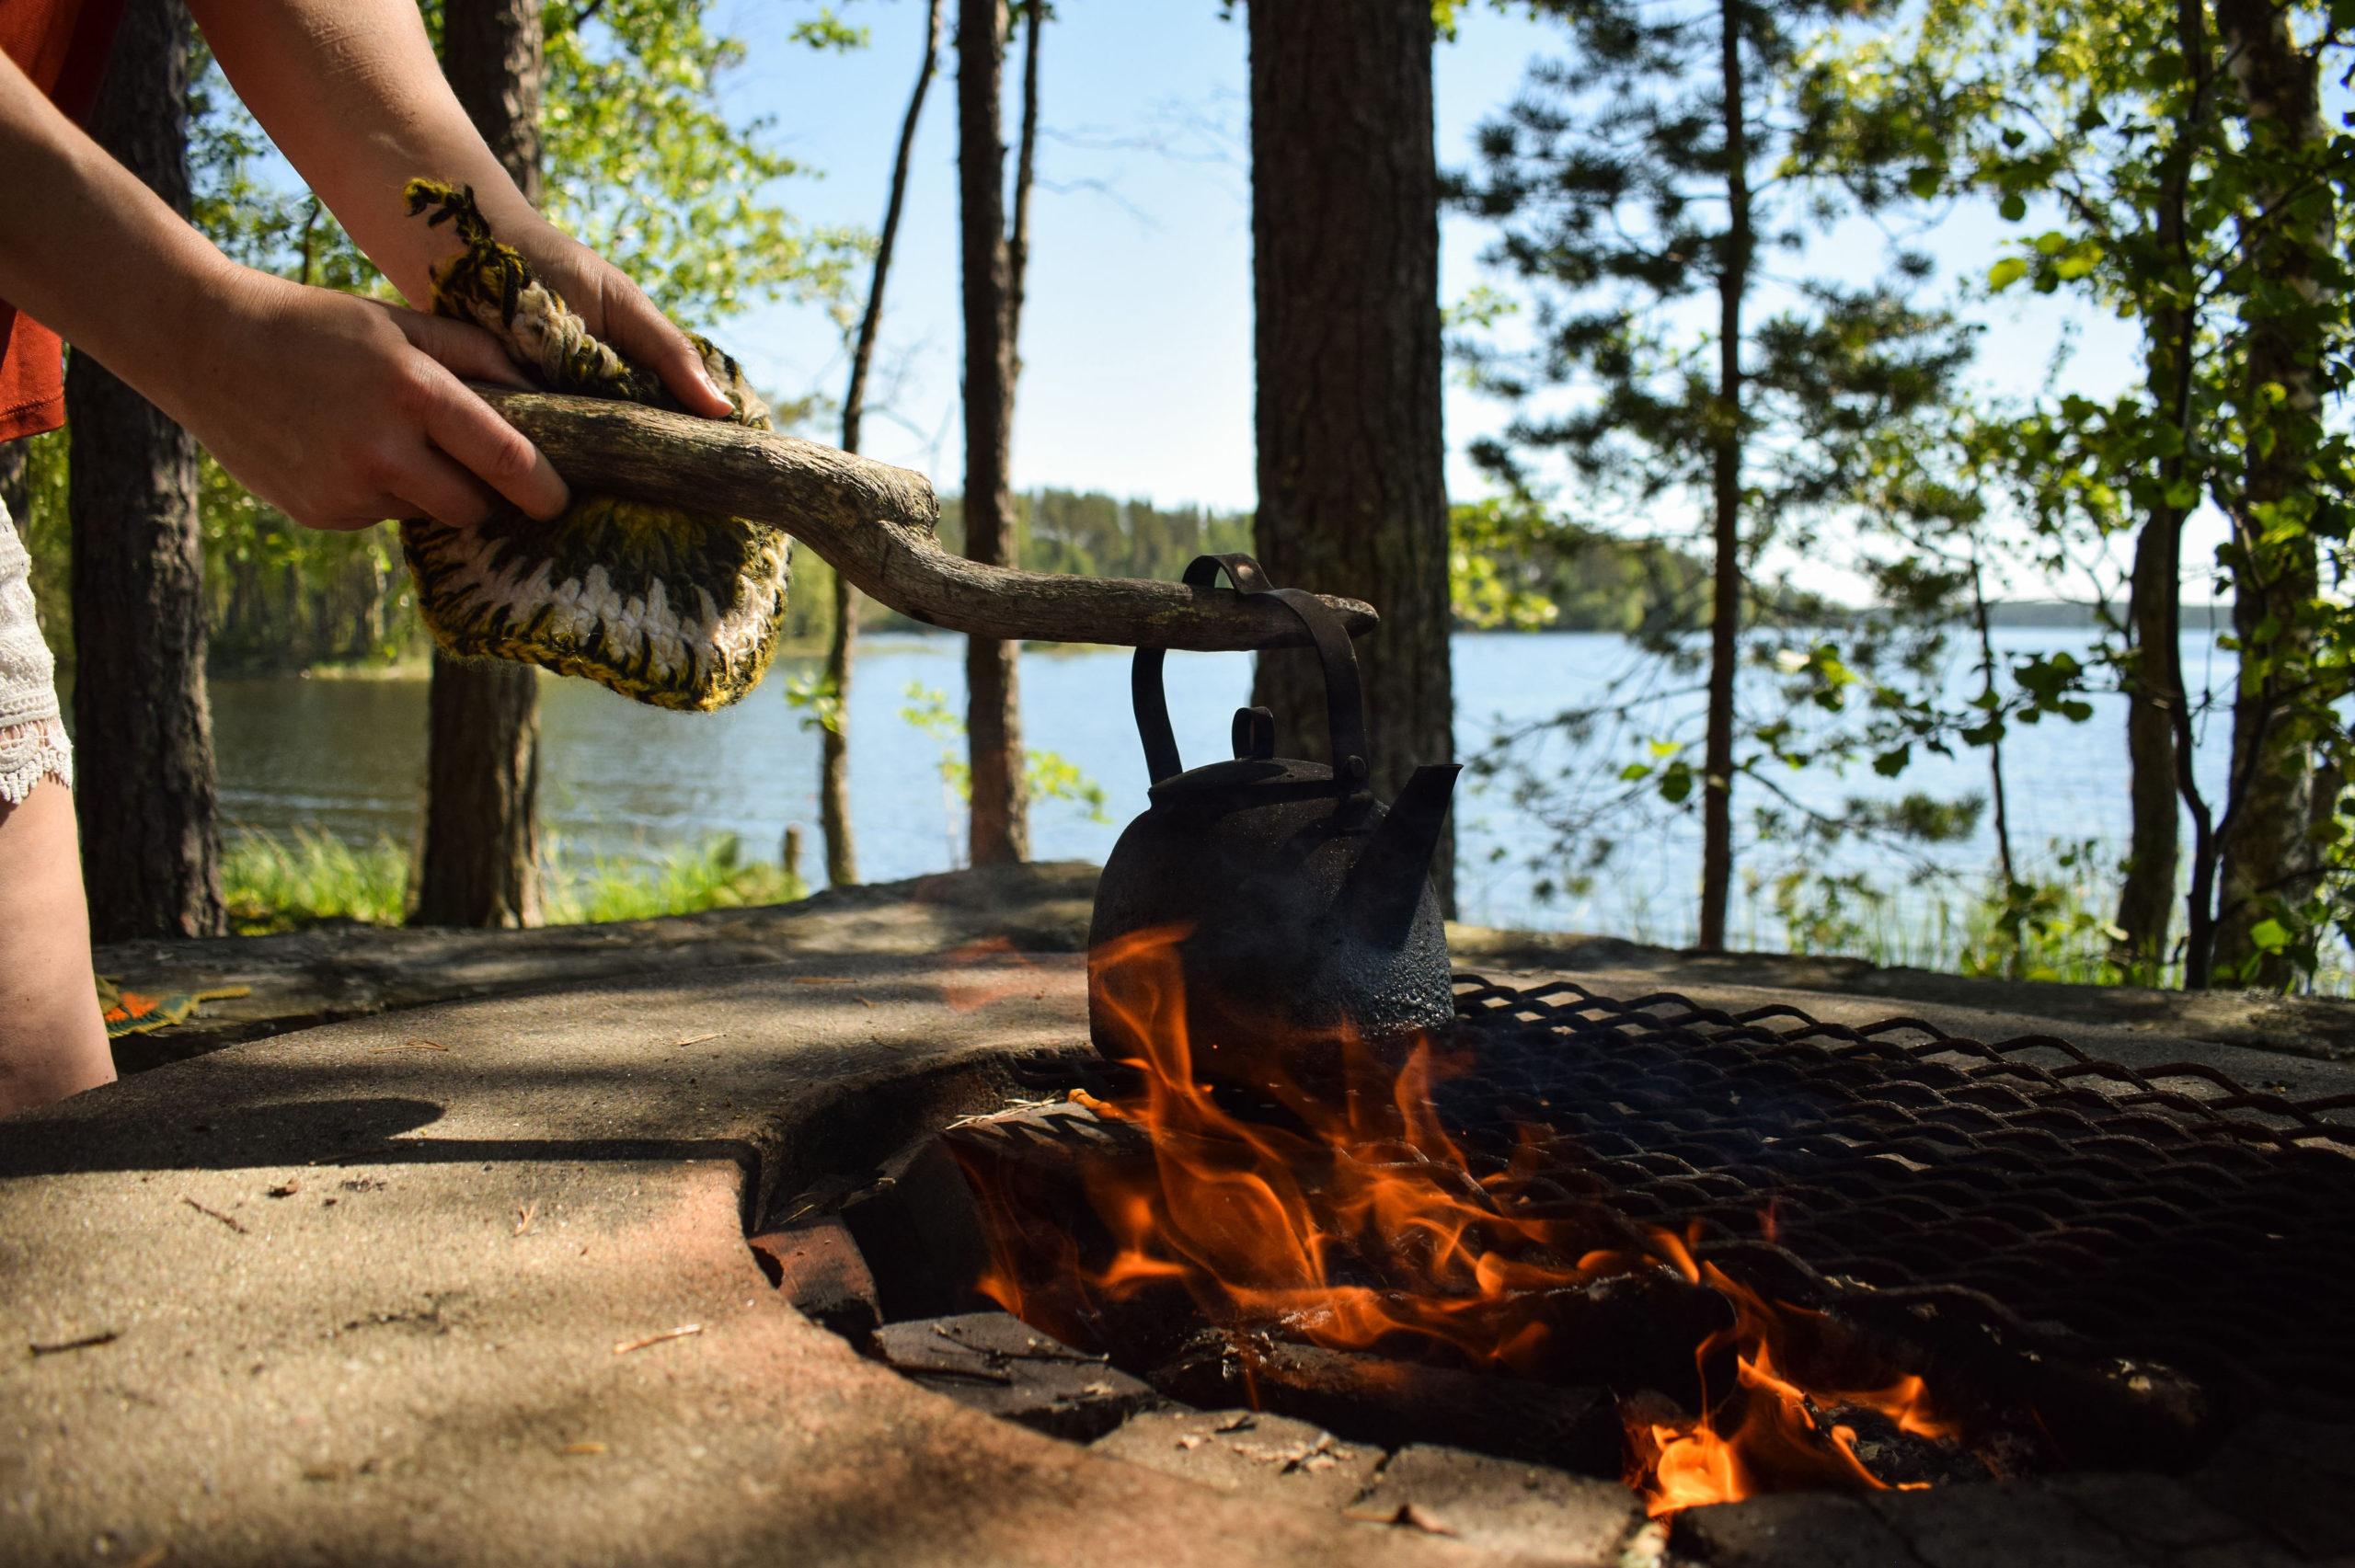 Making coffee by the campfire at Kukkoniemen Lomamökit rental cottages in Punkaharju, Saimaa